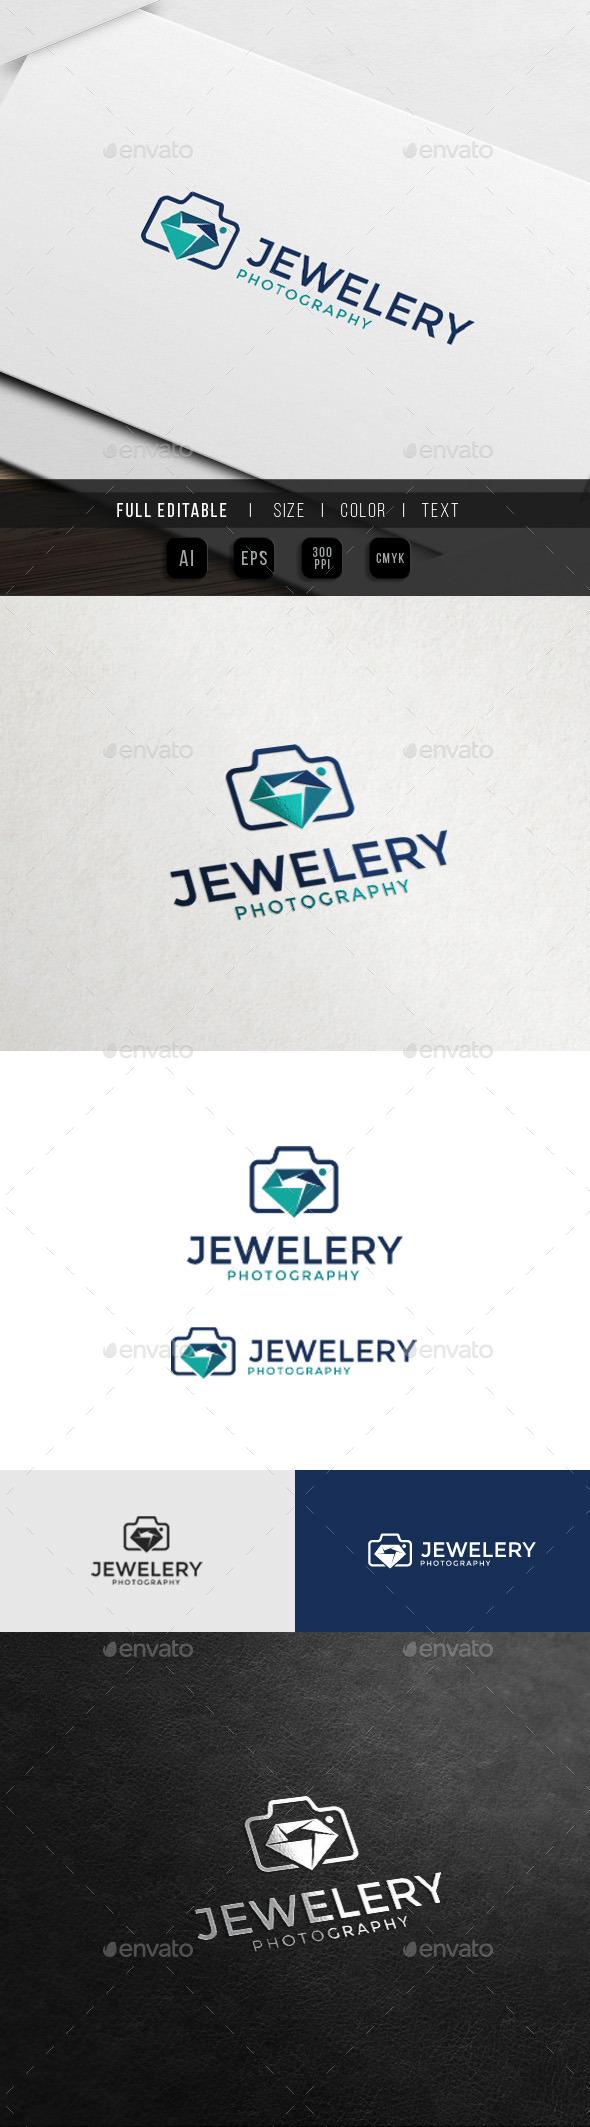 Event Premium Photography - Jewel Camera